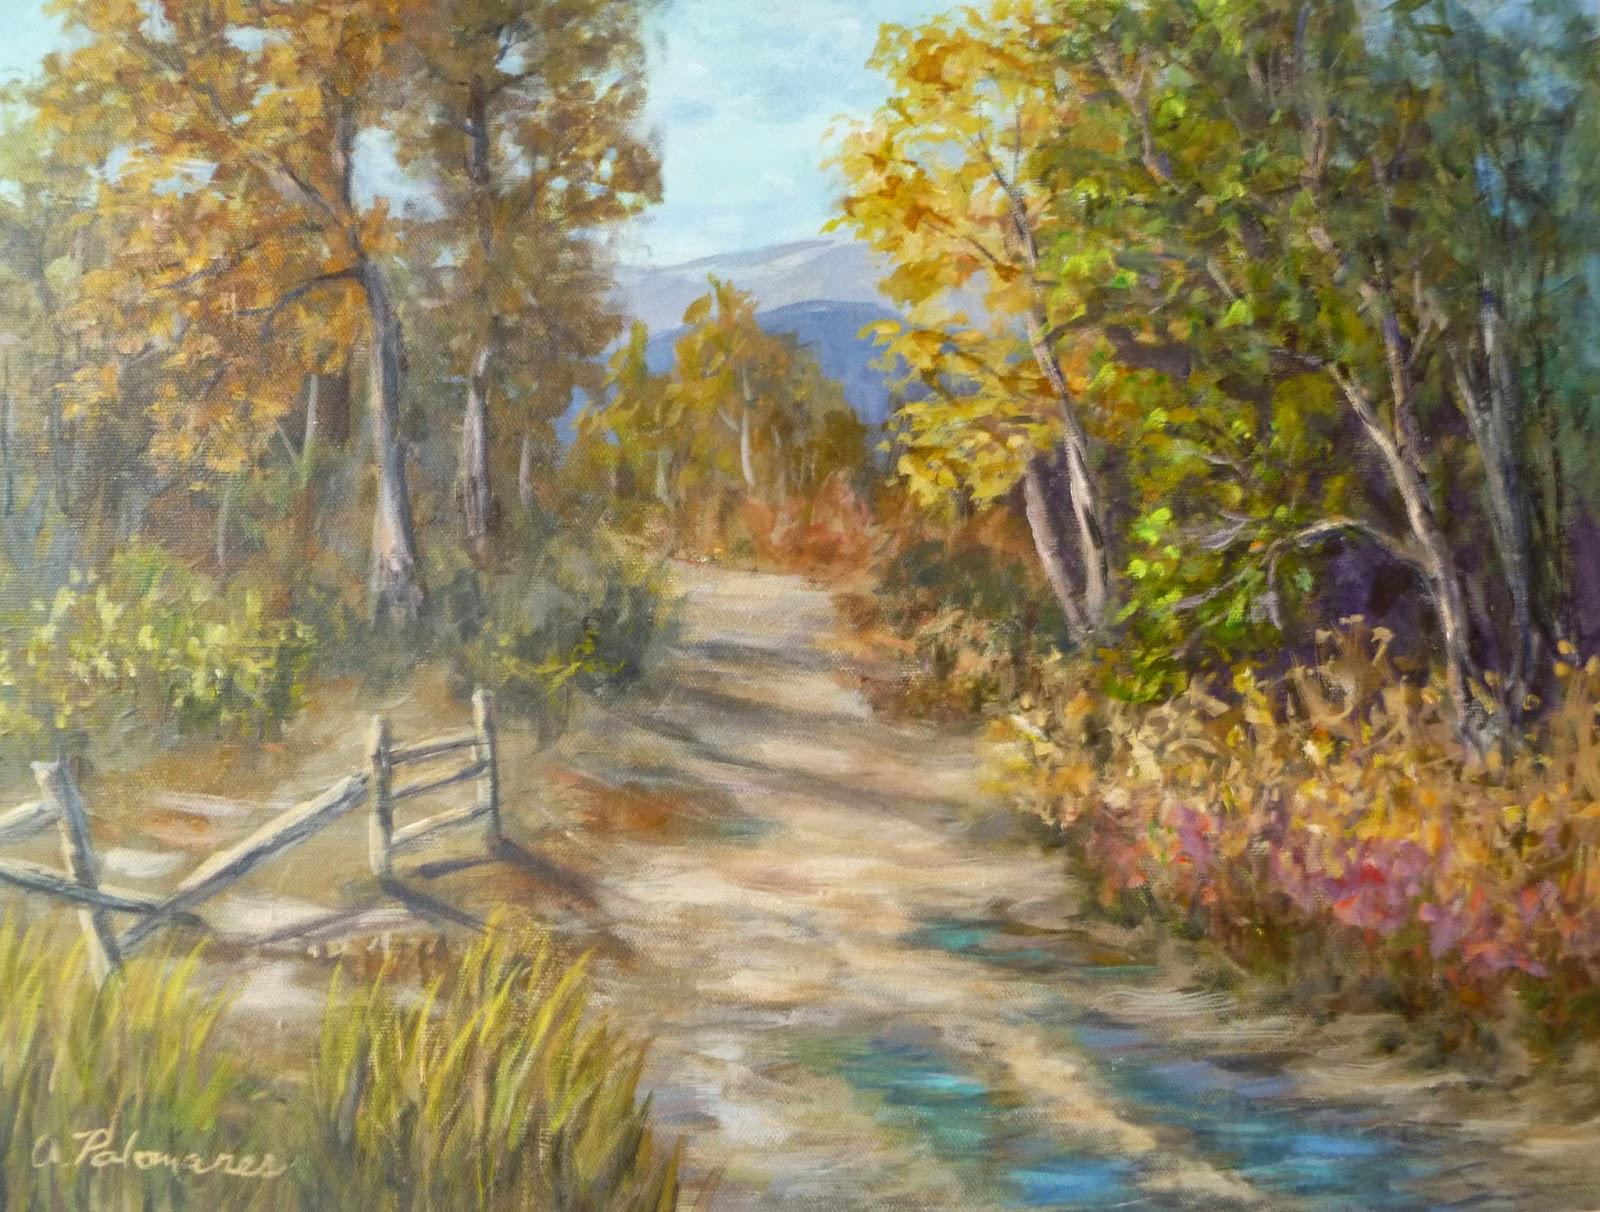 paintings landscape autumn trees painting hills amber tree palomares cottonwood nature fine